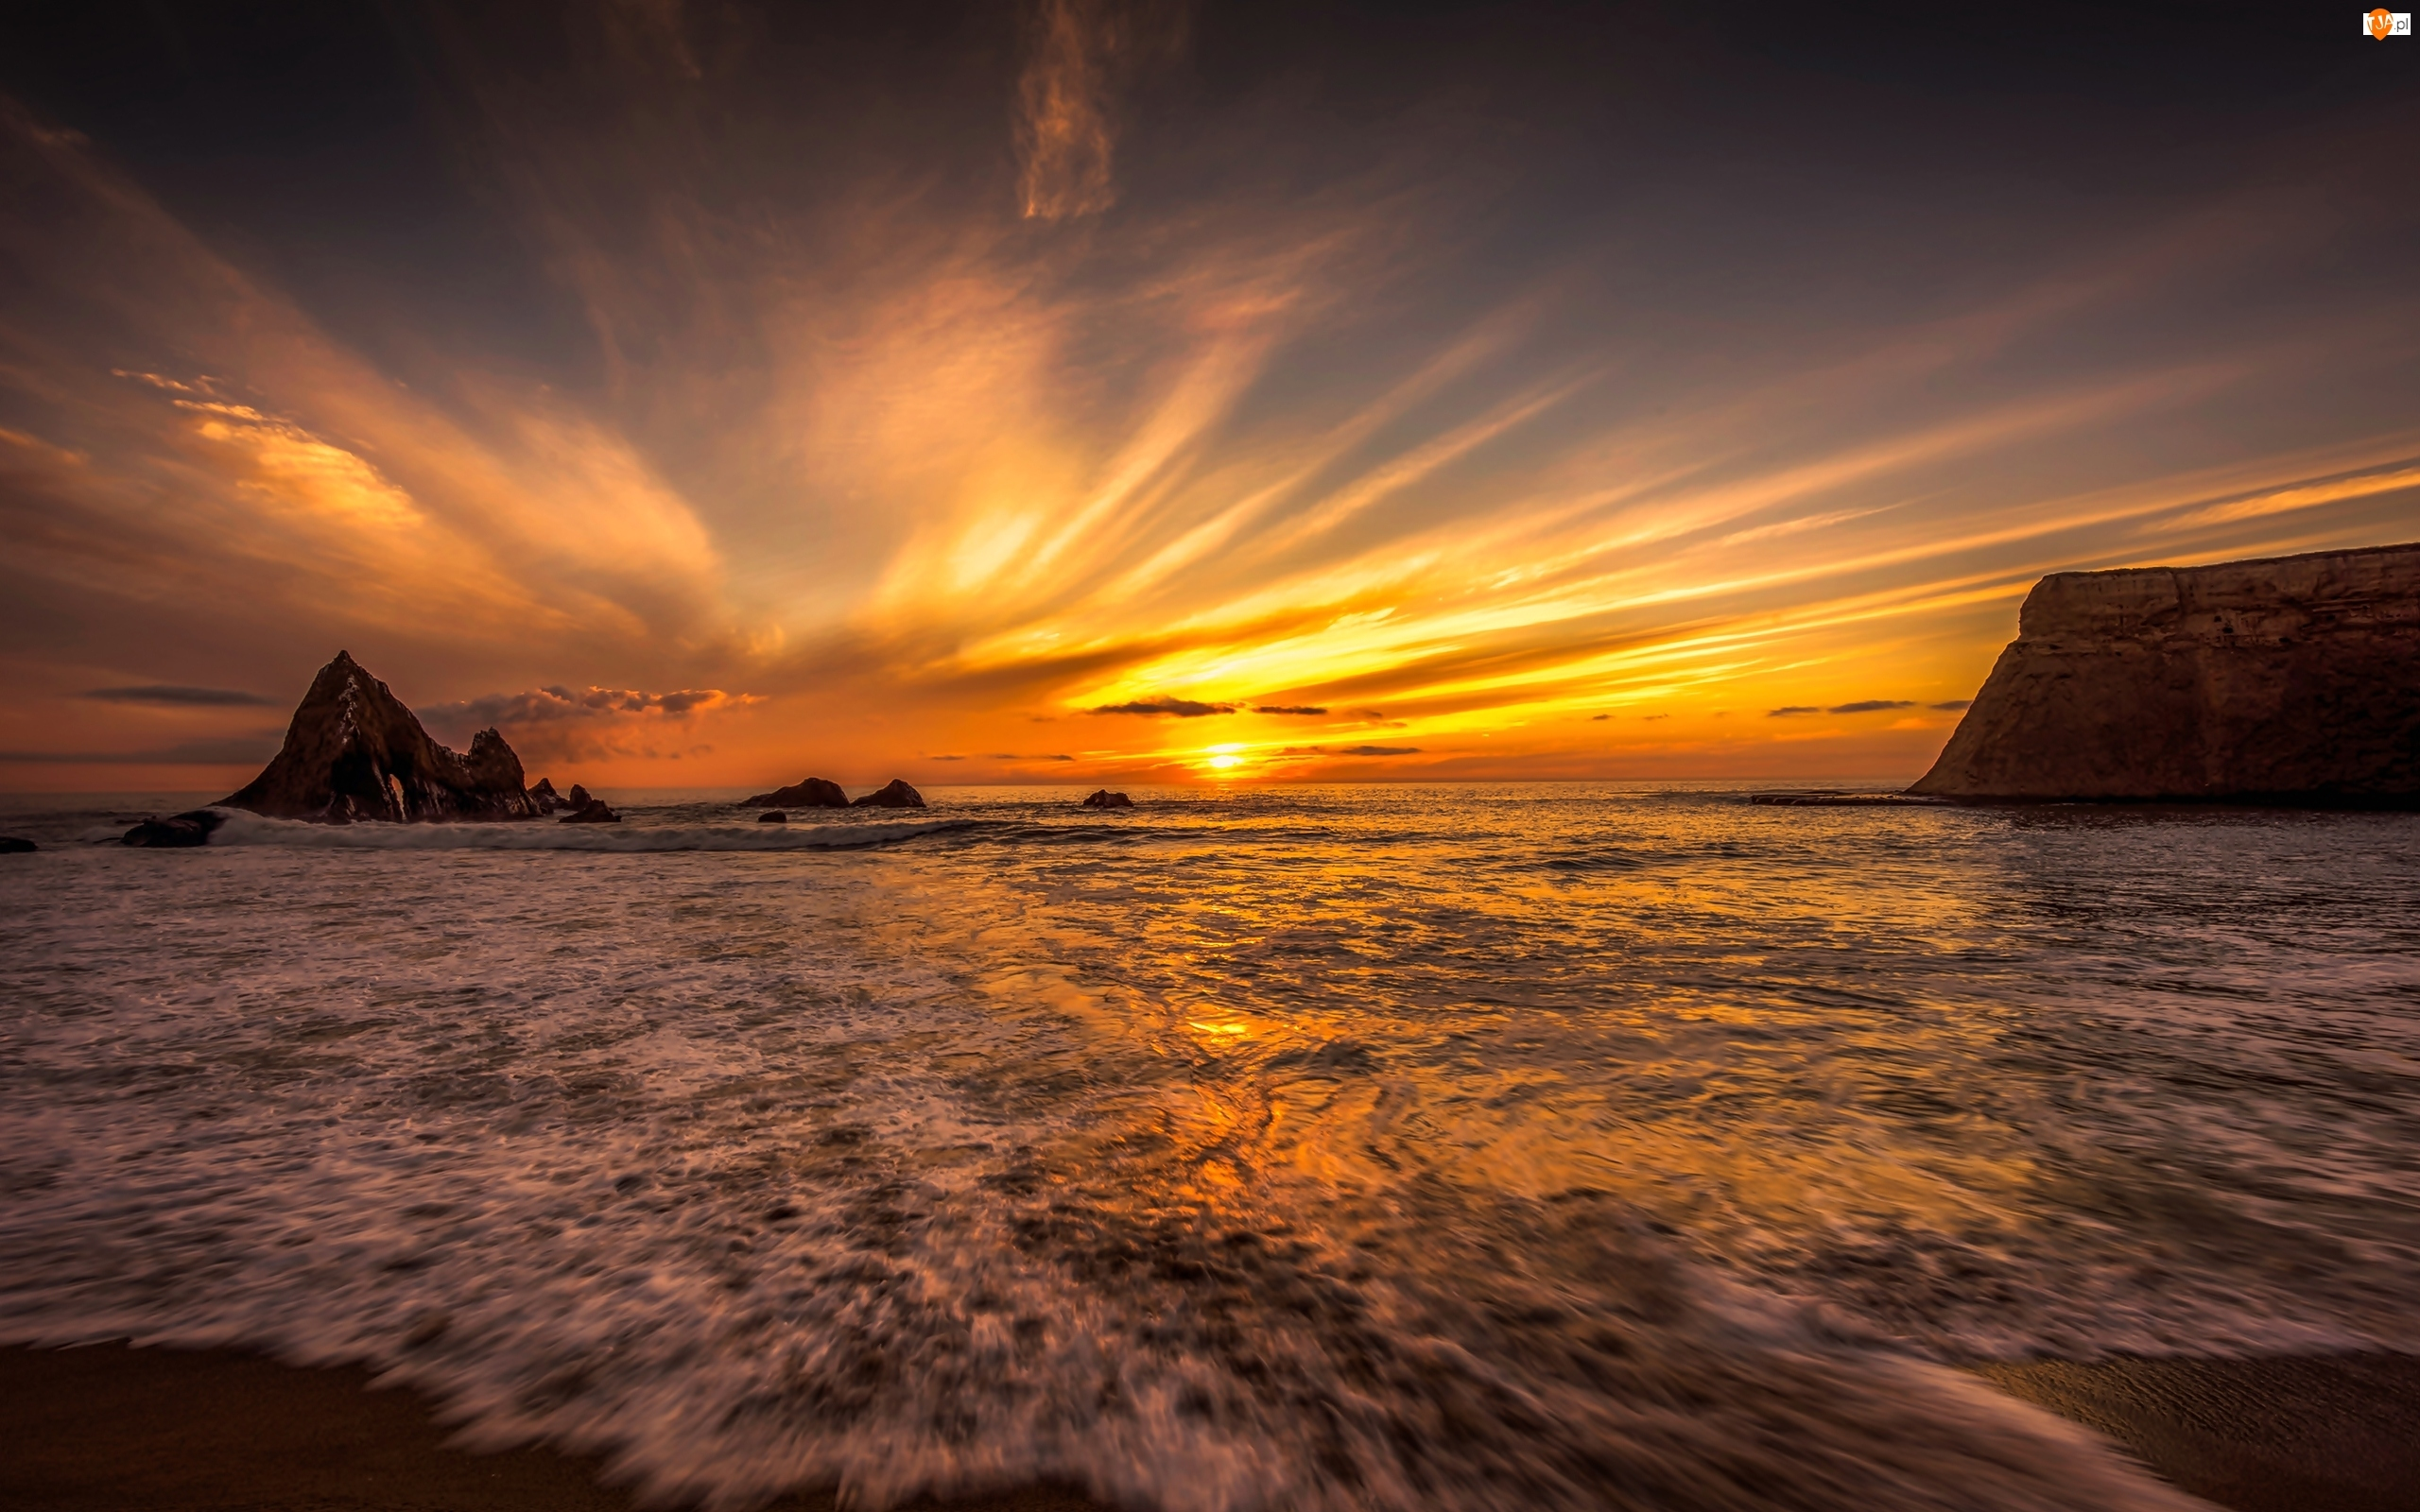 Morze, Blask, Skały, Zachód słońca